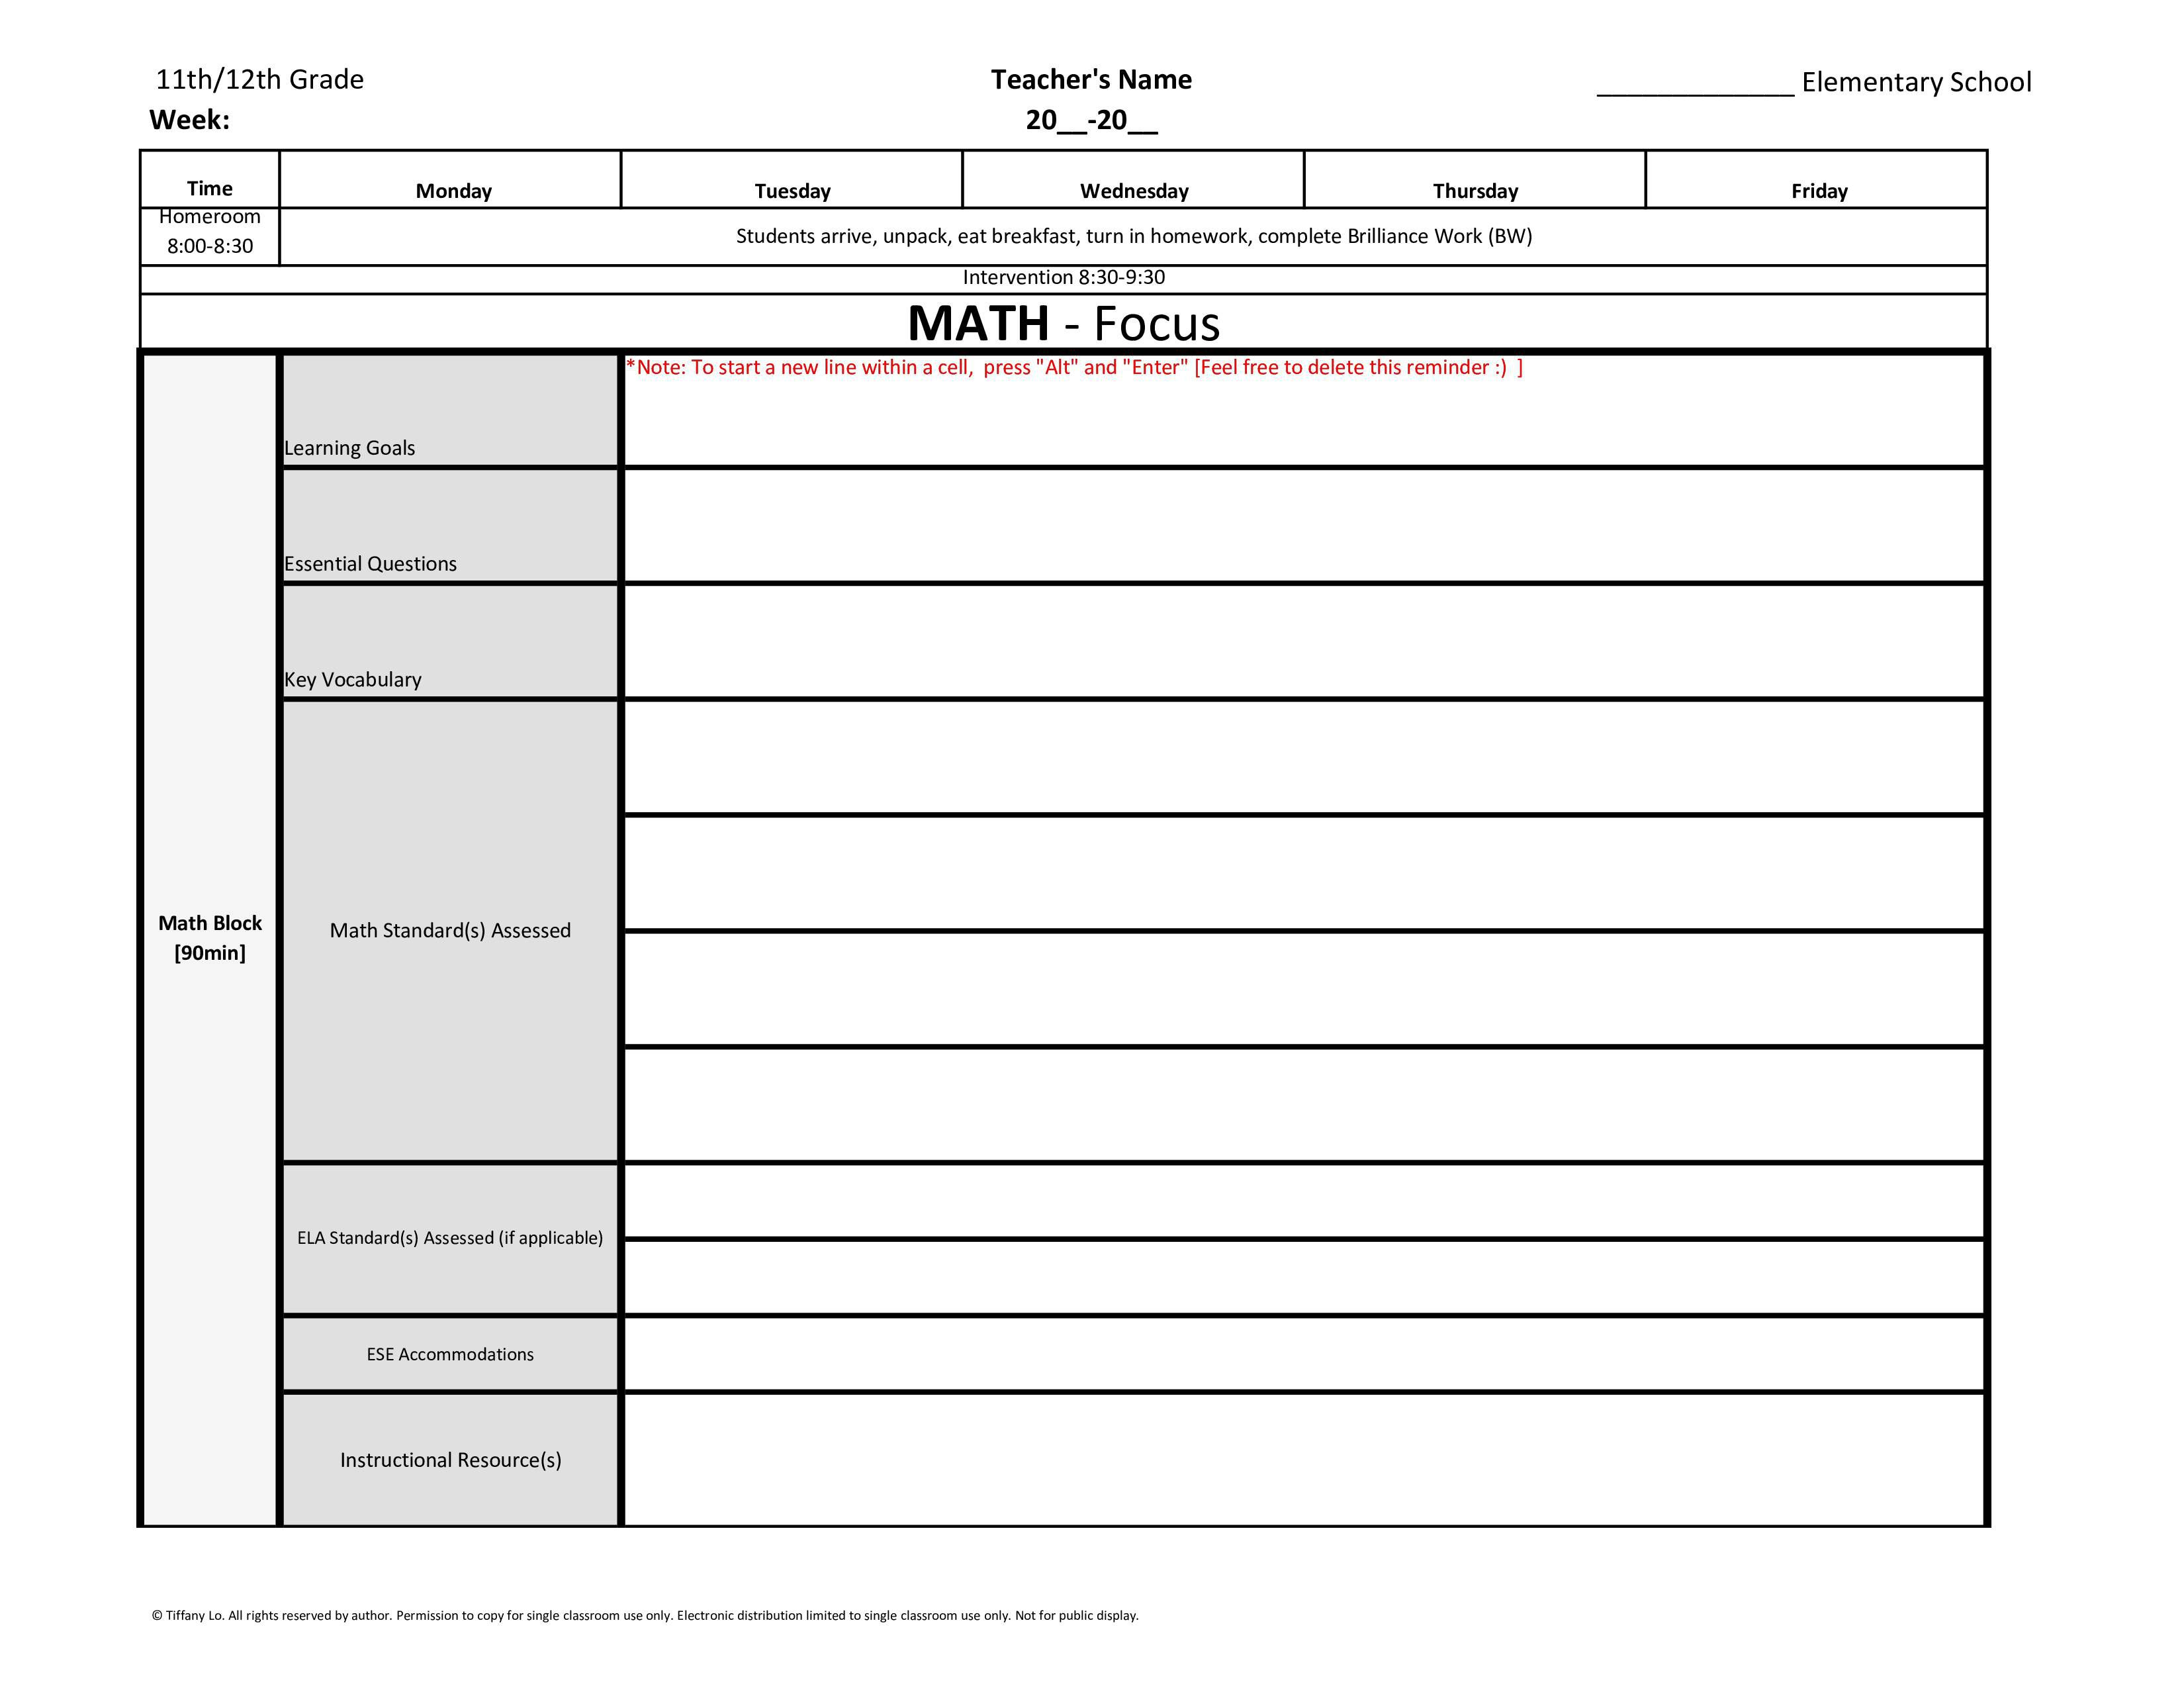 000 Formidable Blank Weekly Lesson Plan Template Inspiration  Printable Pdf Free EditableFull